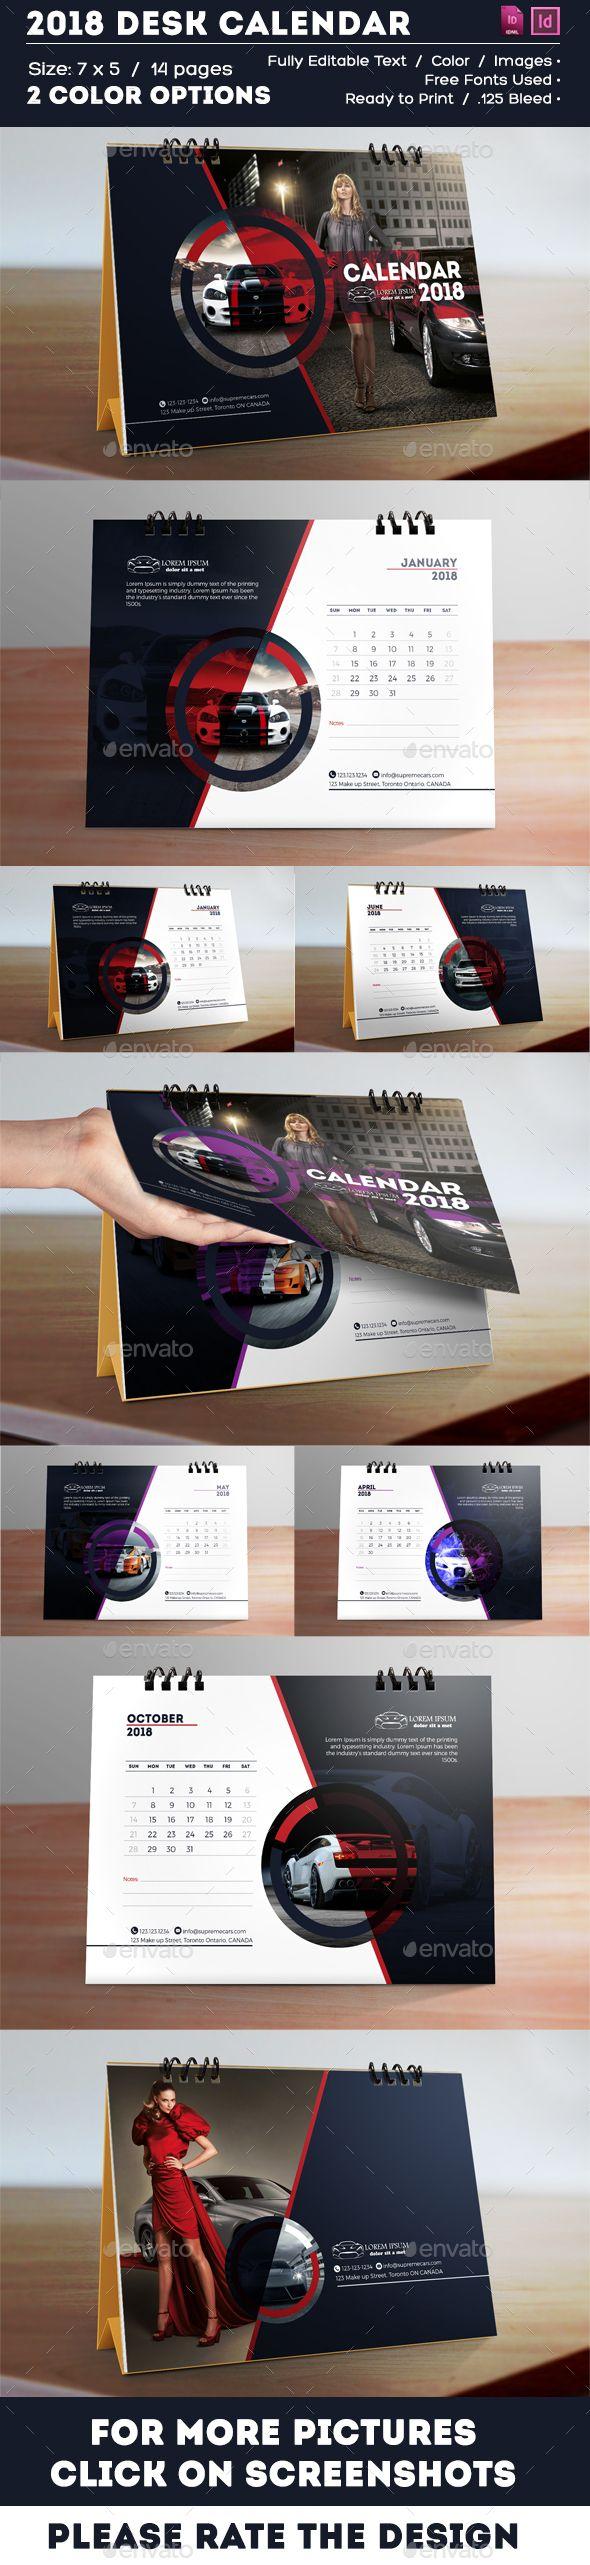 Calendar - 2018 Creative Desk Calendar - Multipurpose